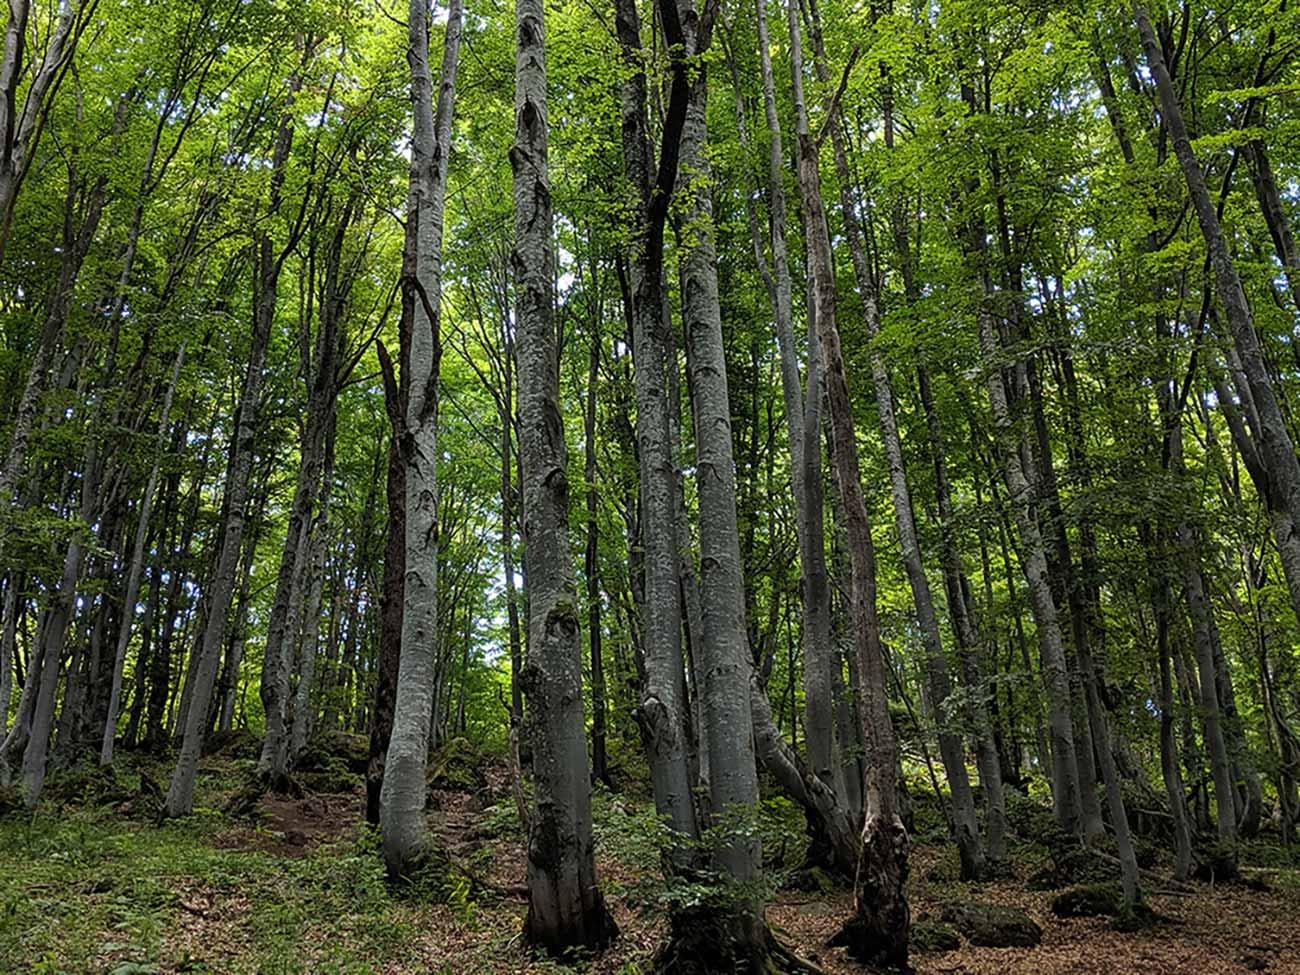 Wooded area on Vitosha Mountain Hike